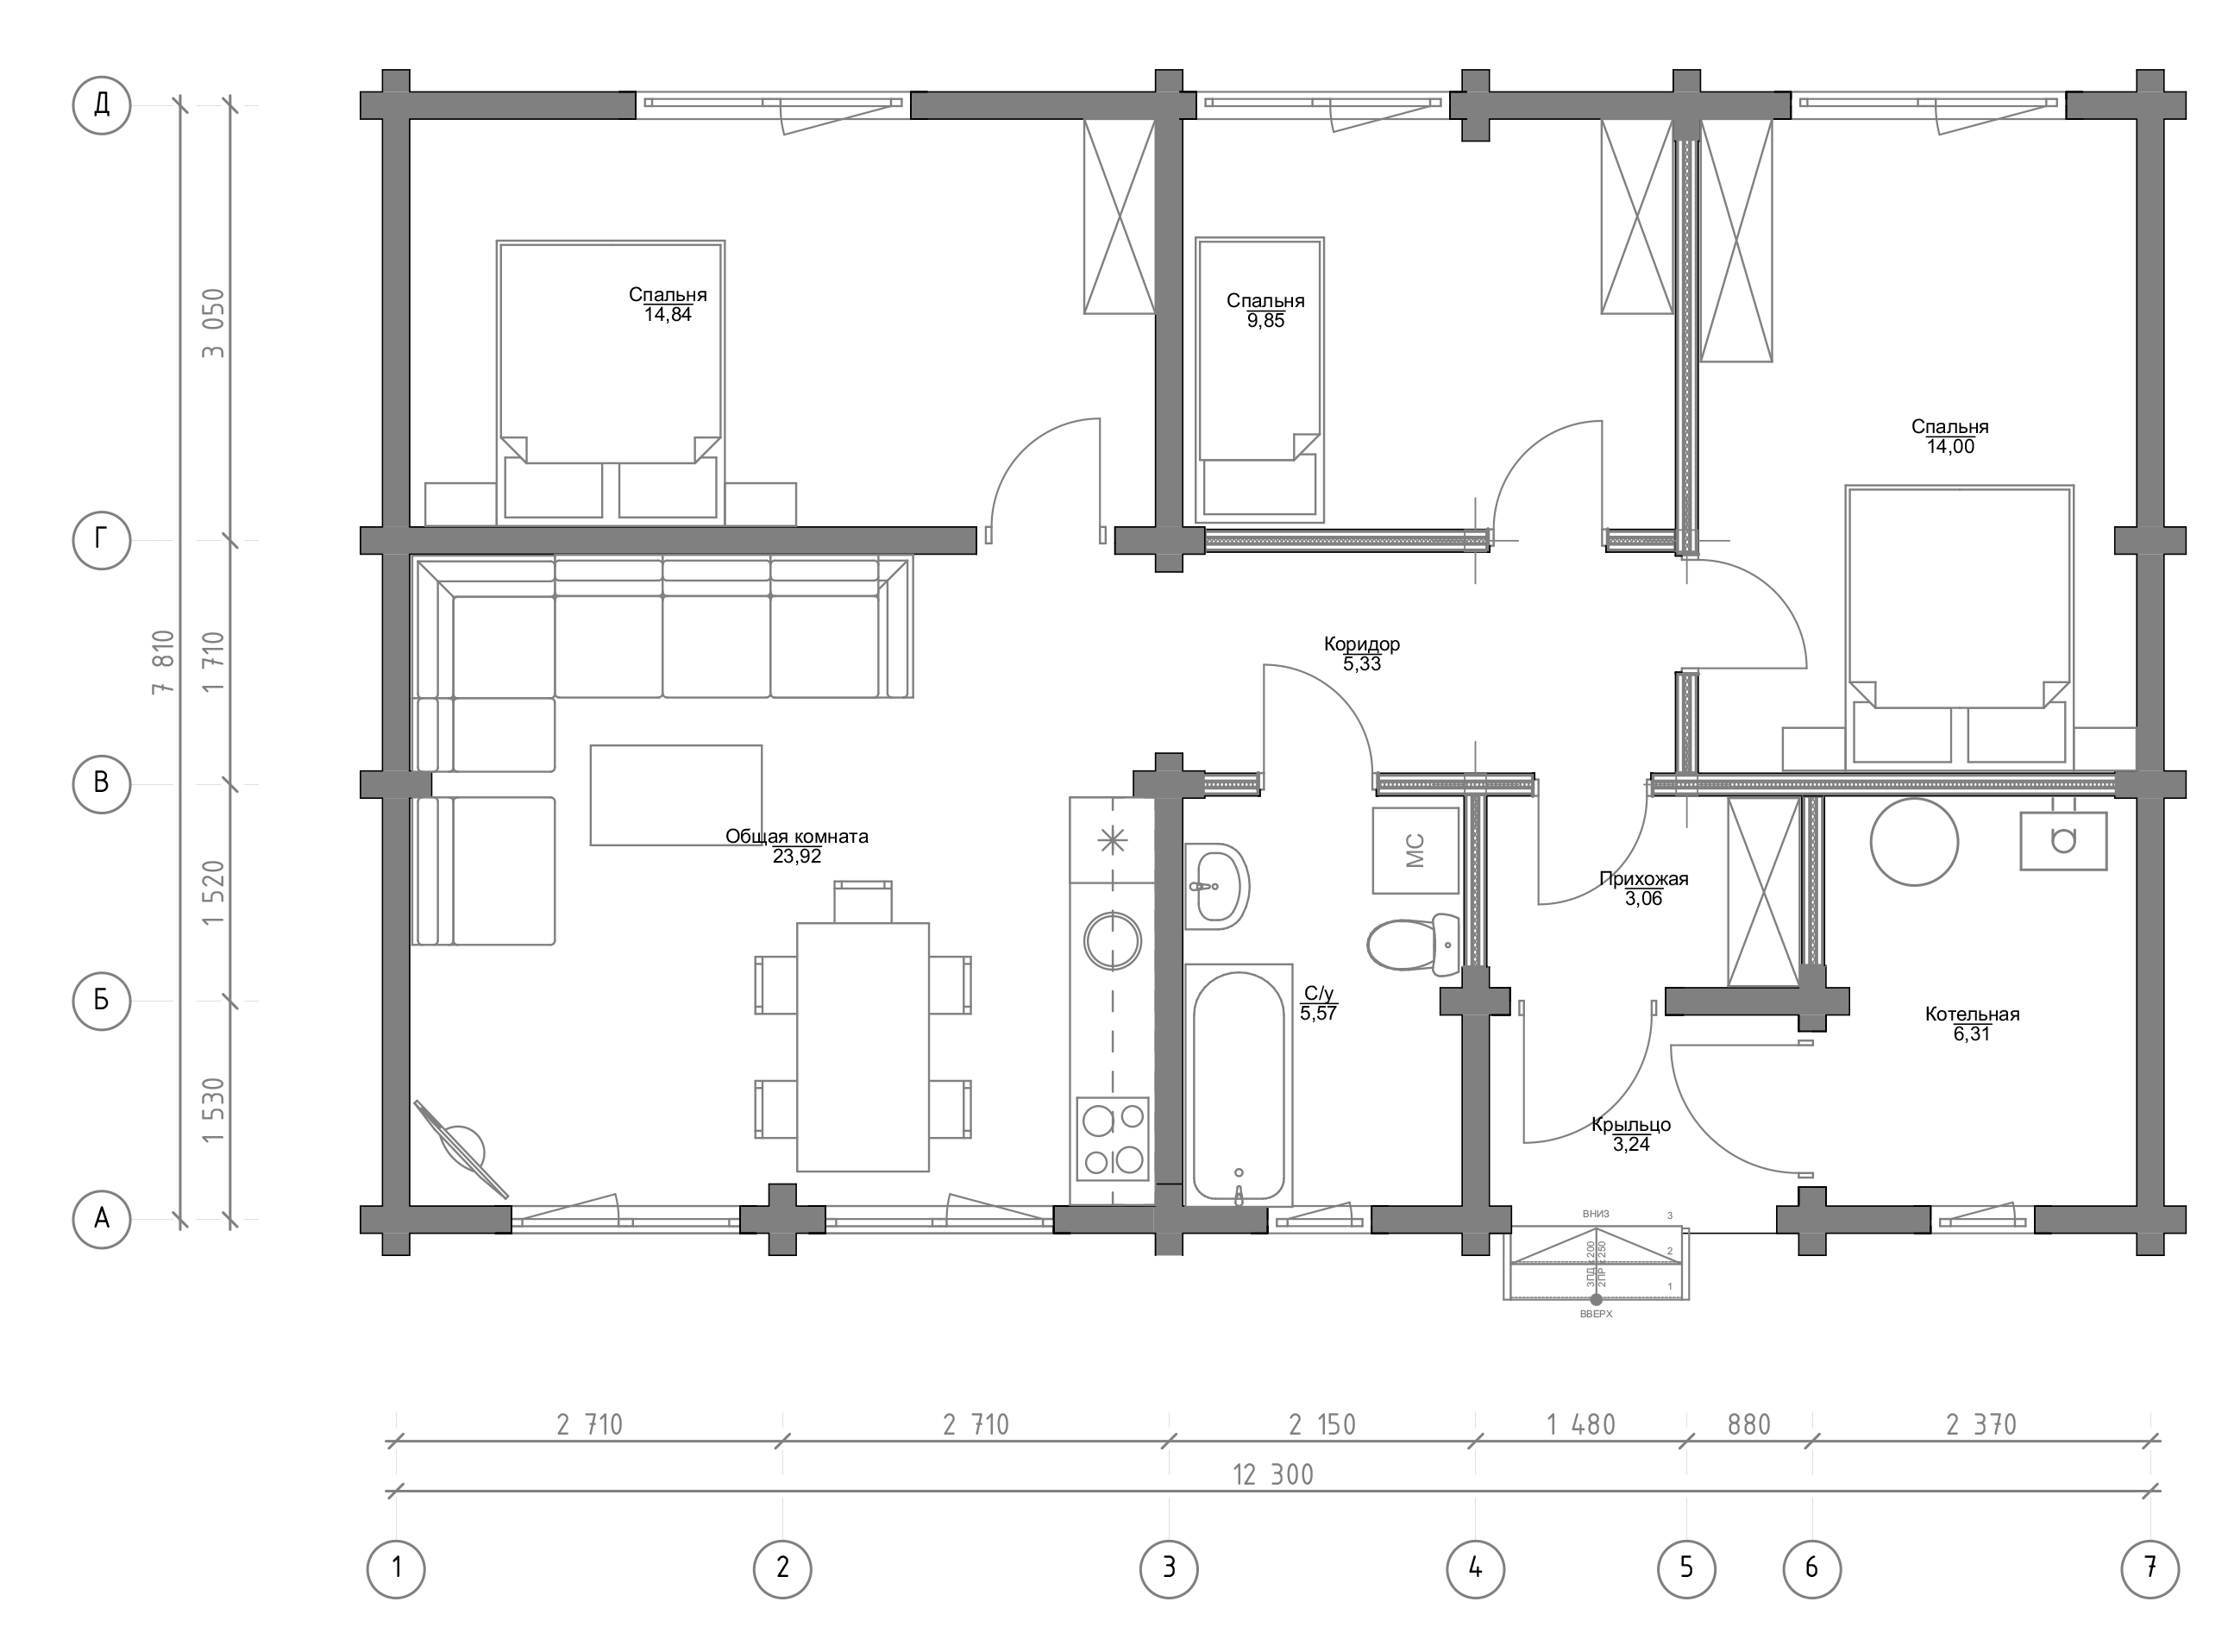 План первого этажа Dortmund 1.0 (Дом Дортмунд)